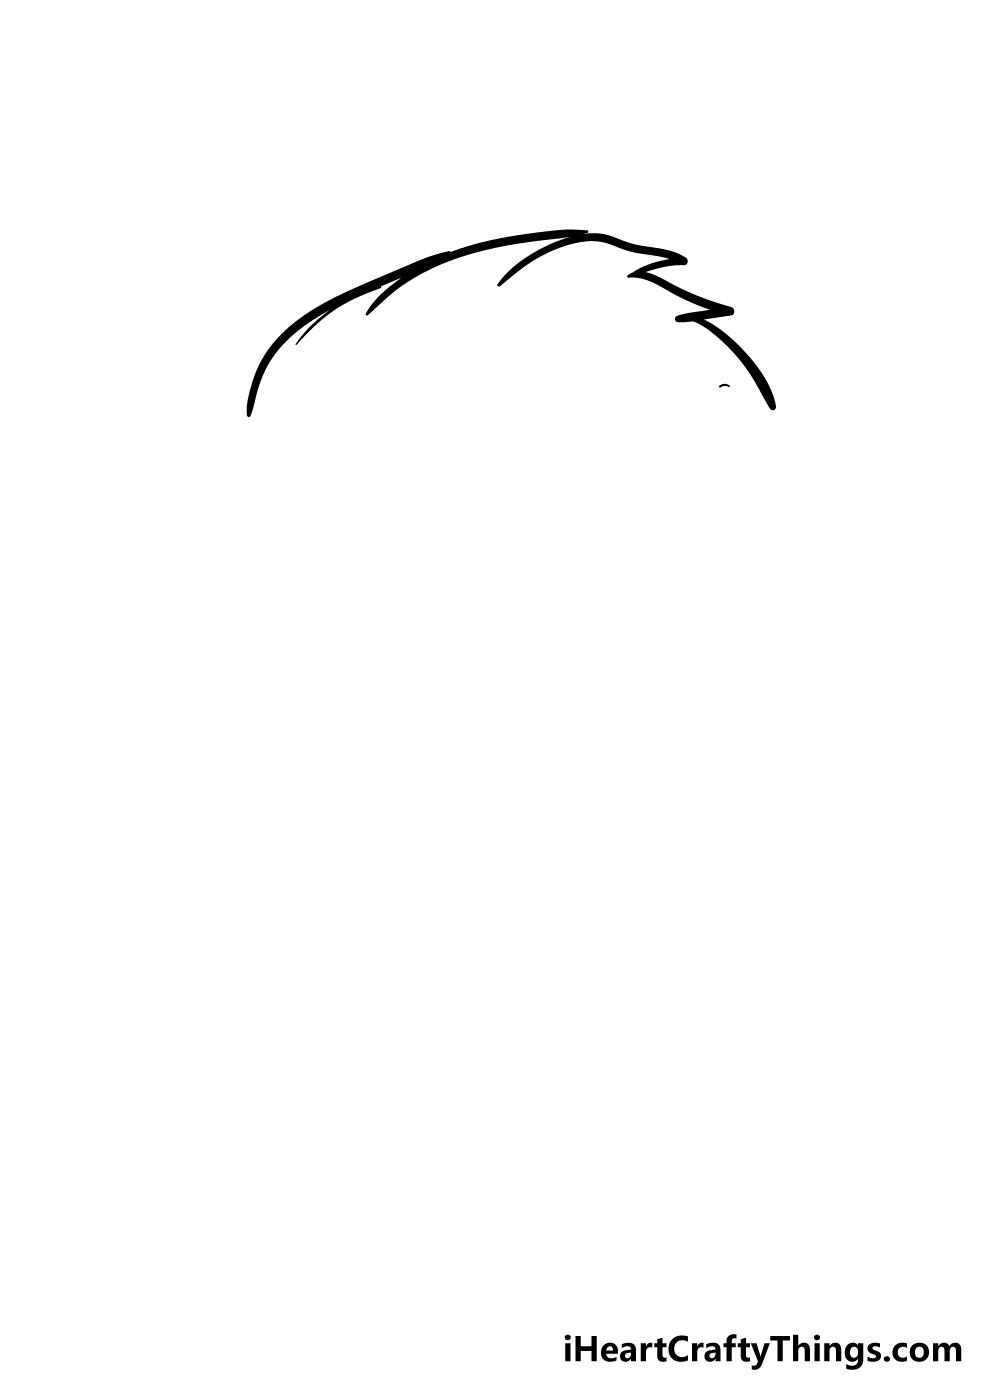 boy's hair drawing step 1